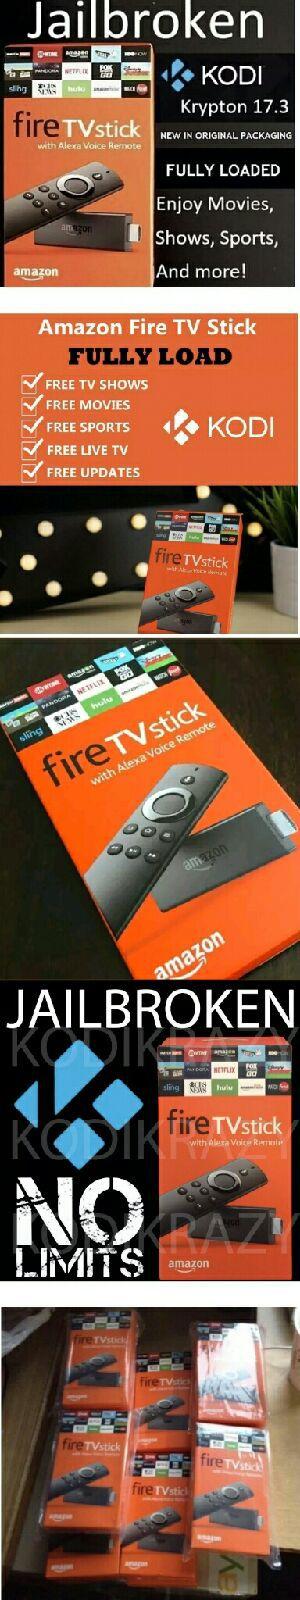 🔥 🔥 Amazon Fire Tv Stick Firestick Unlocked Jailbroken w Live TV Kodi 17.6 Movies and PPVs Android TV Box Killer🔥 🔥 for Sale in Las Vegas, NV